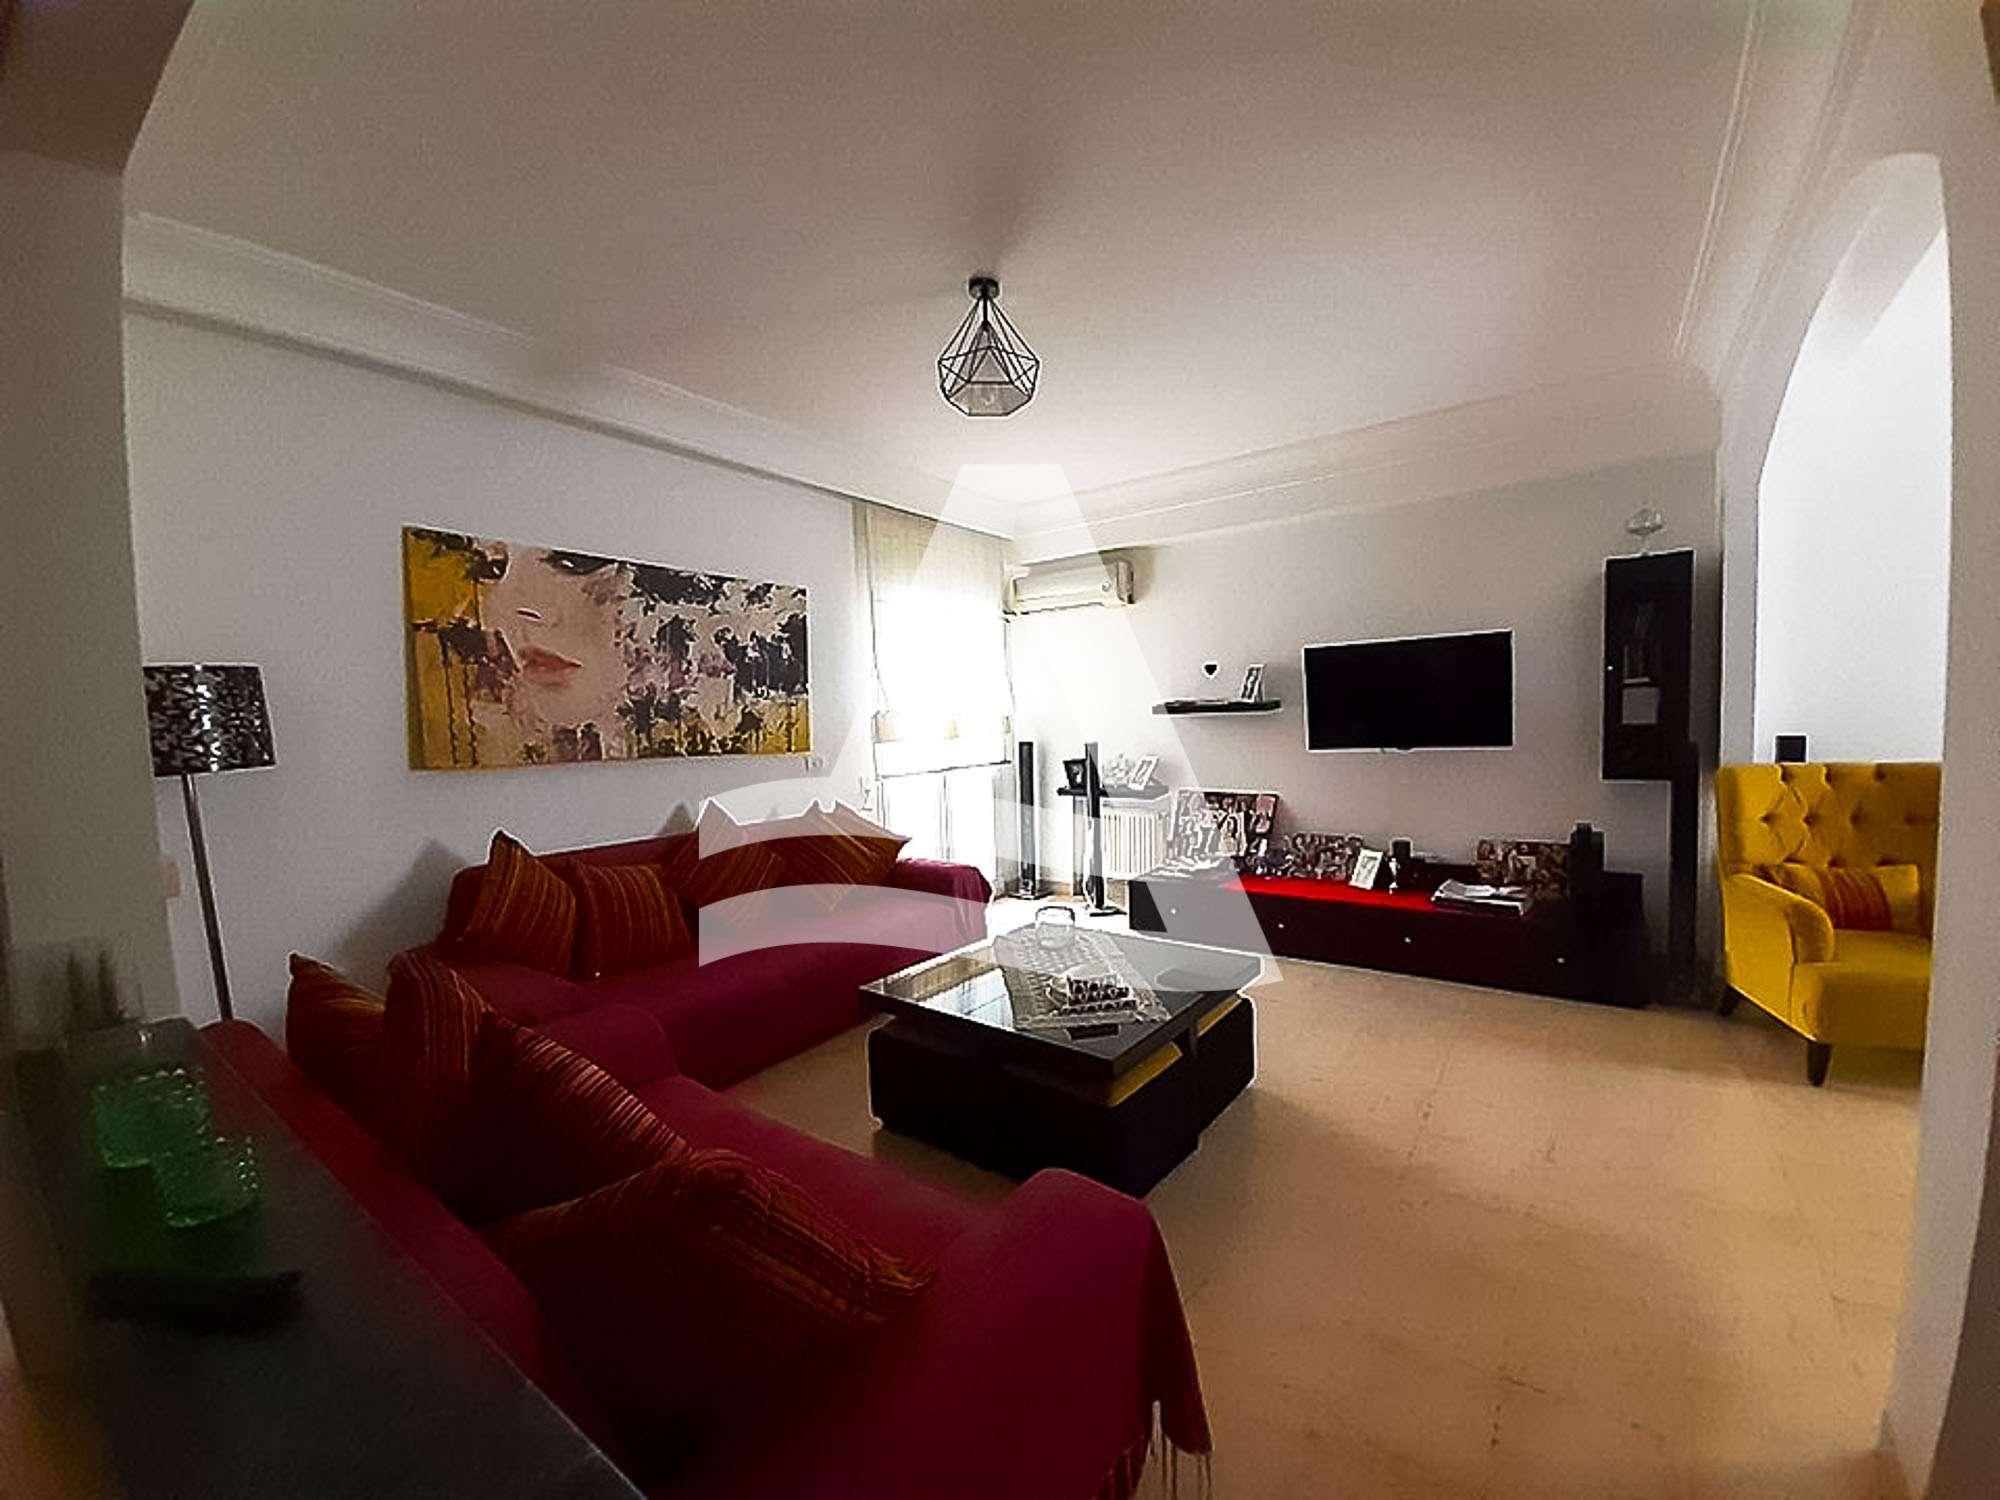 httpss3.amazonaws.comlogimoaws_Arcane_immobilière_la_Marsa-_location_-_vente_la_marsa_16_sur_16_1574071698456-1